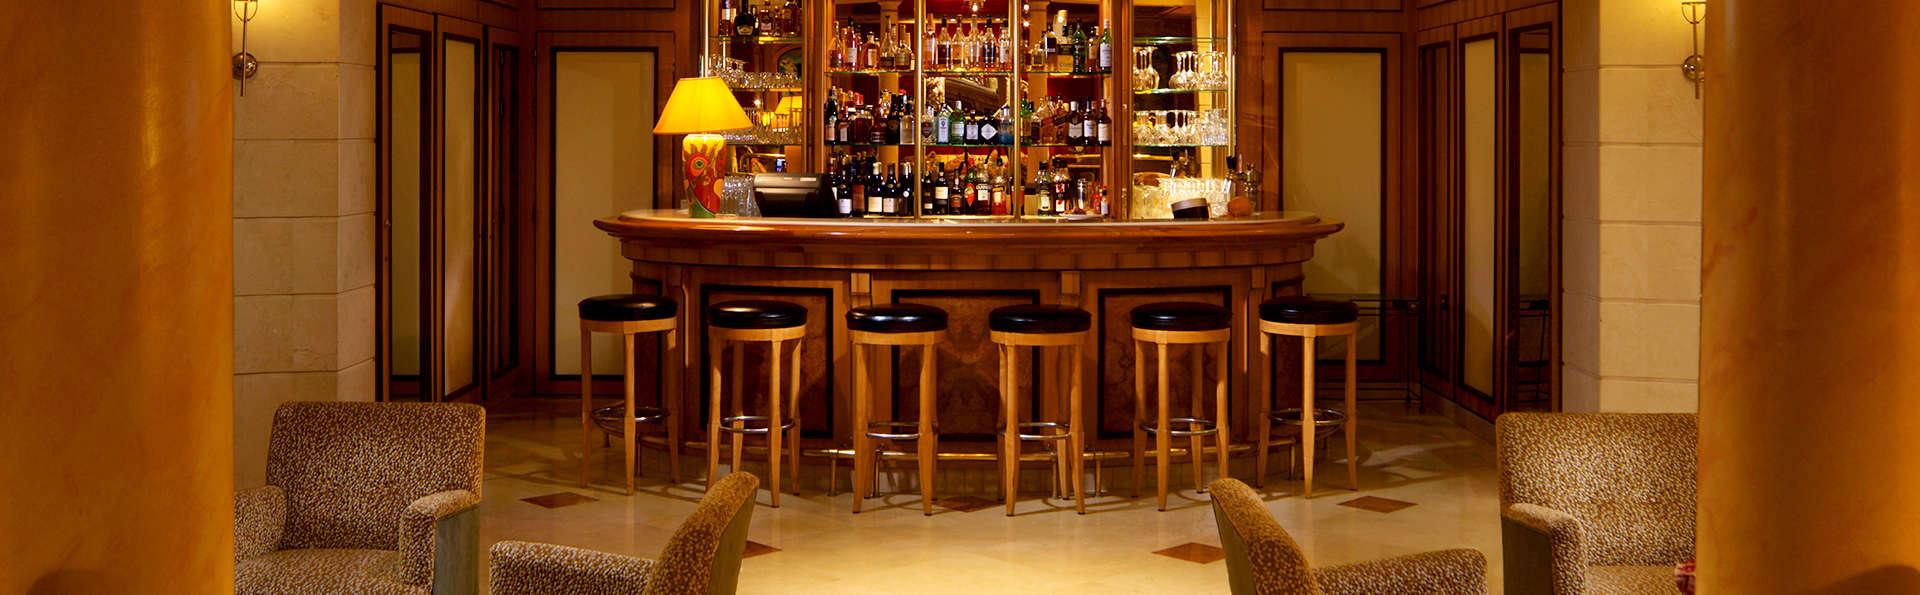 Hotel Parc Belair - EDIT_NEW_BAR.jpg